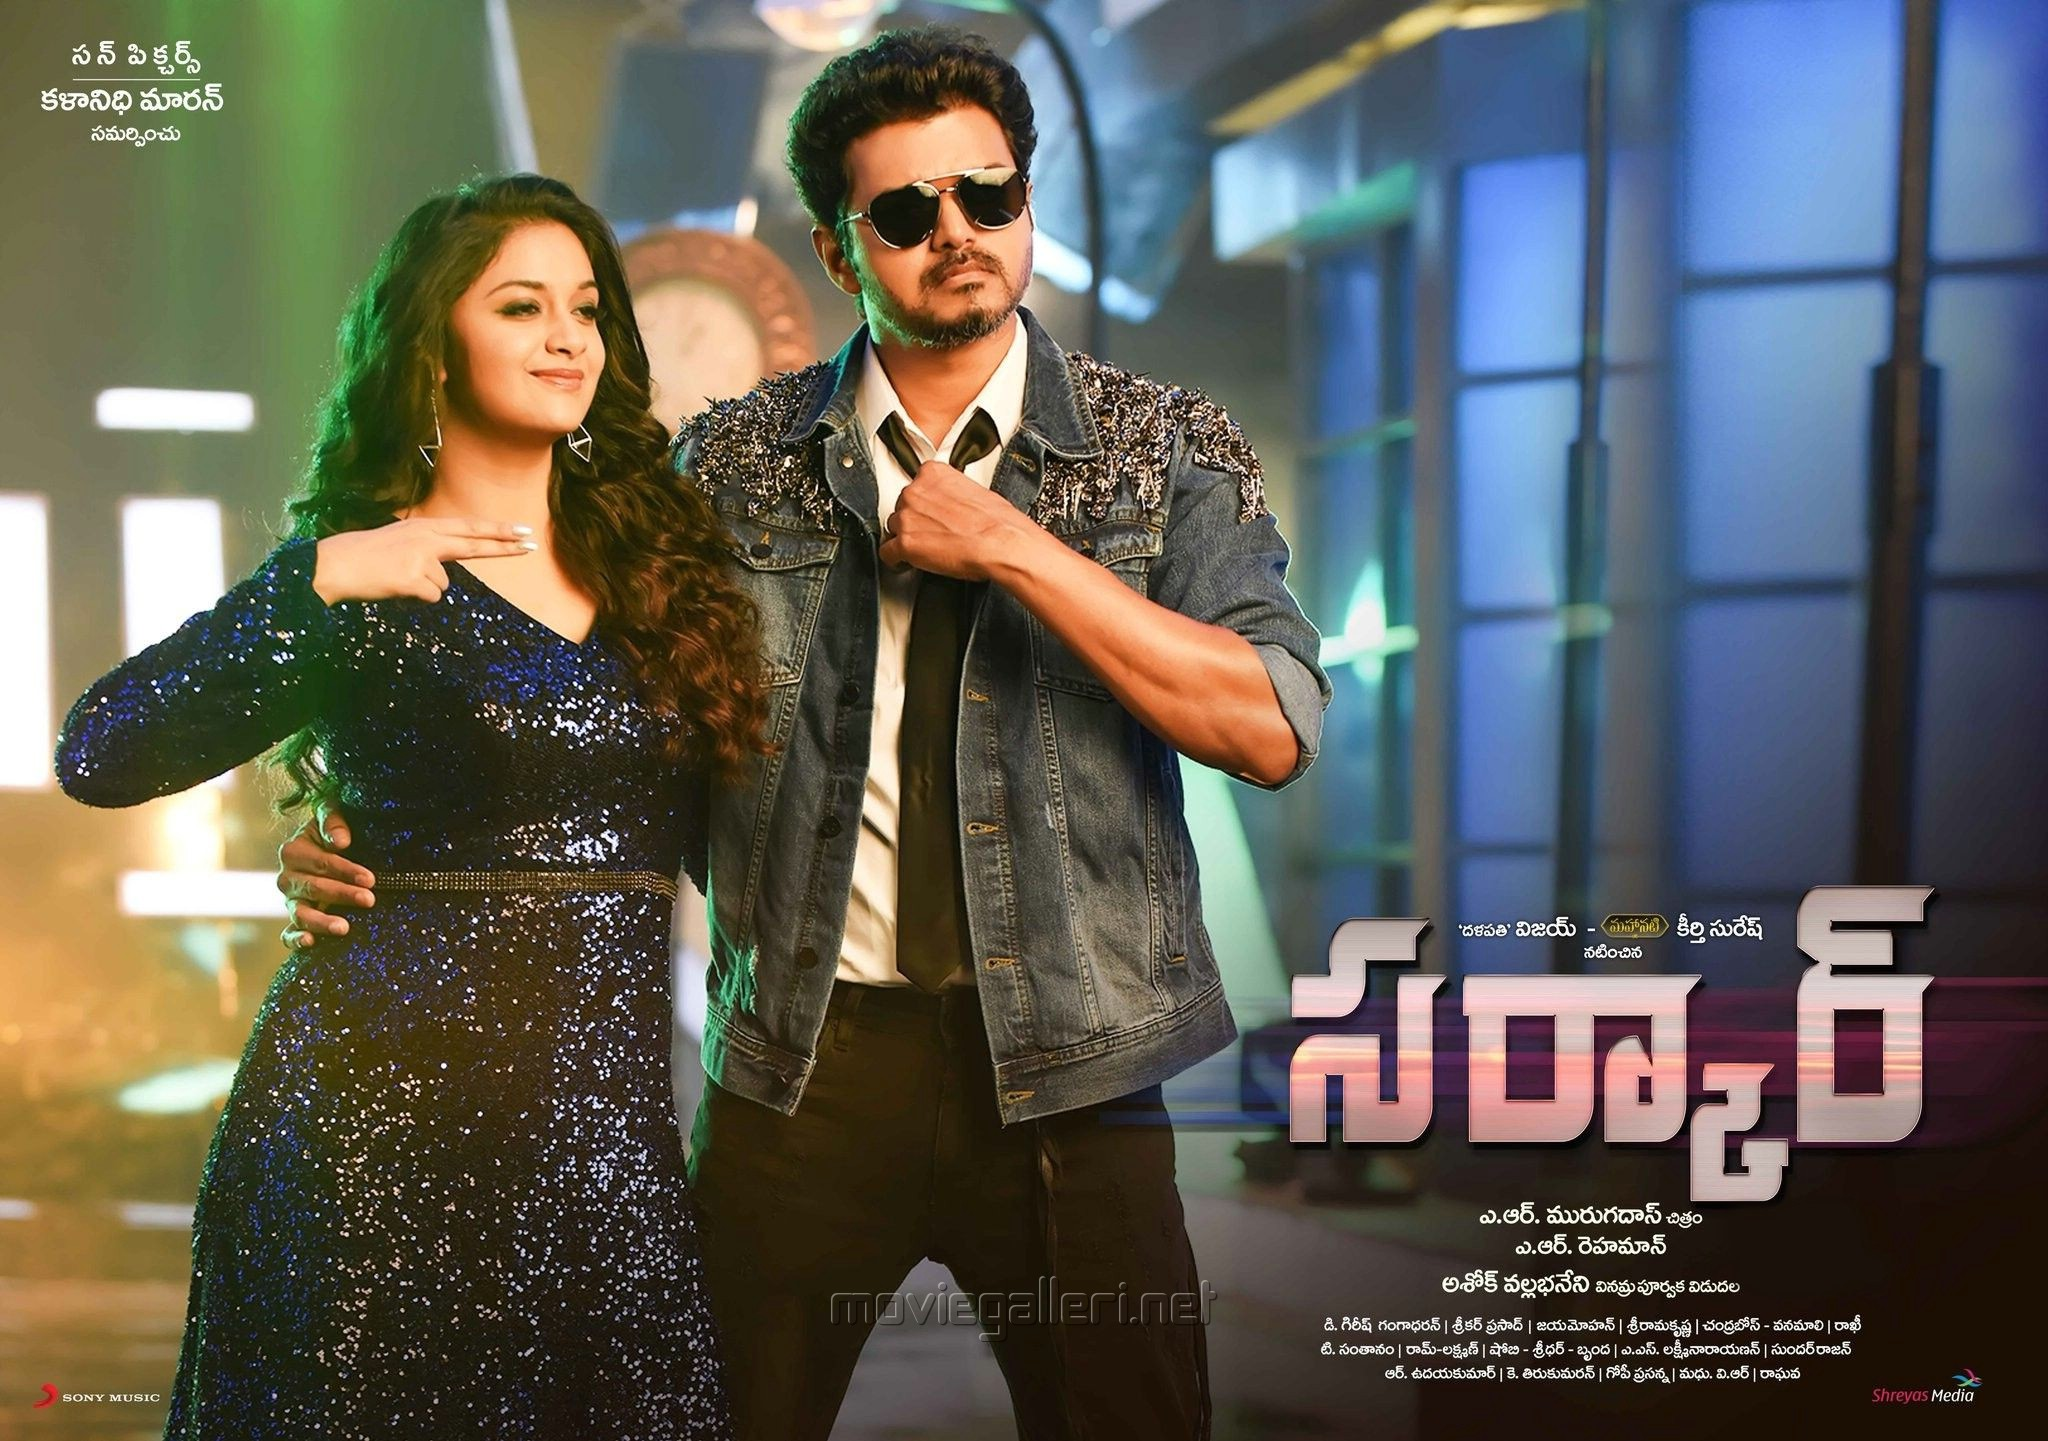 Keerthy Suresh Vijay Sarkar Telugu Movie Posters